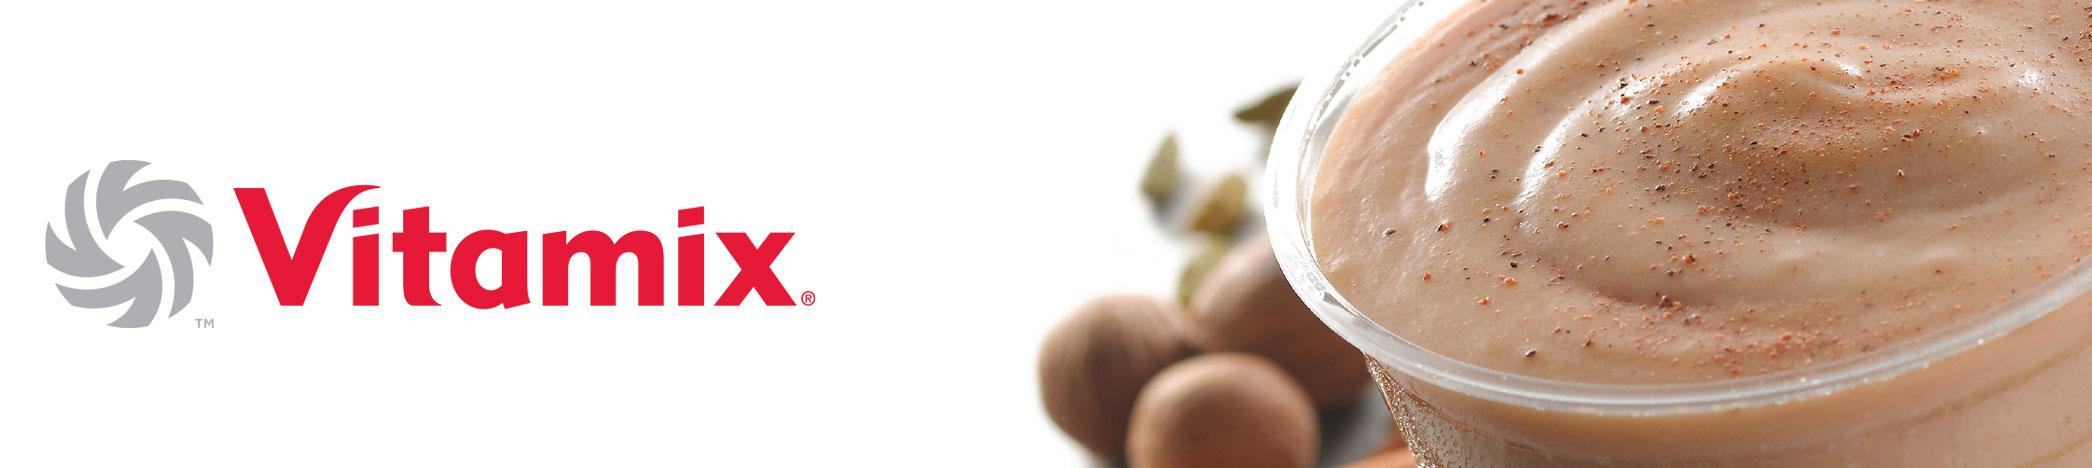 vitamix-brand.jpg